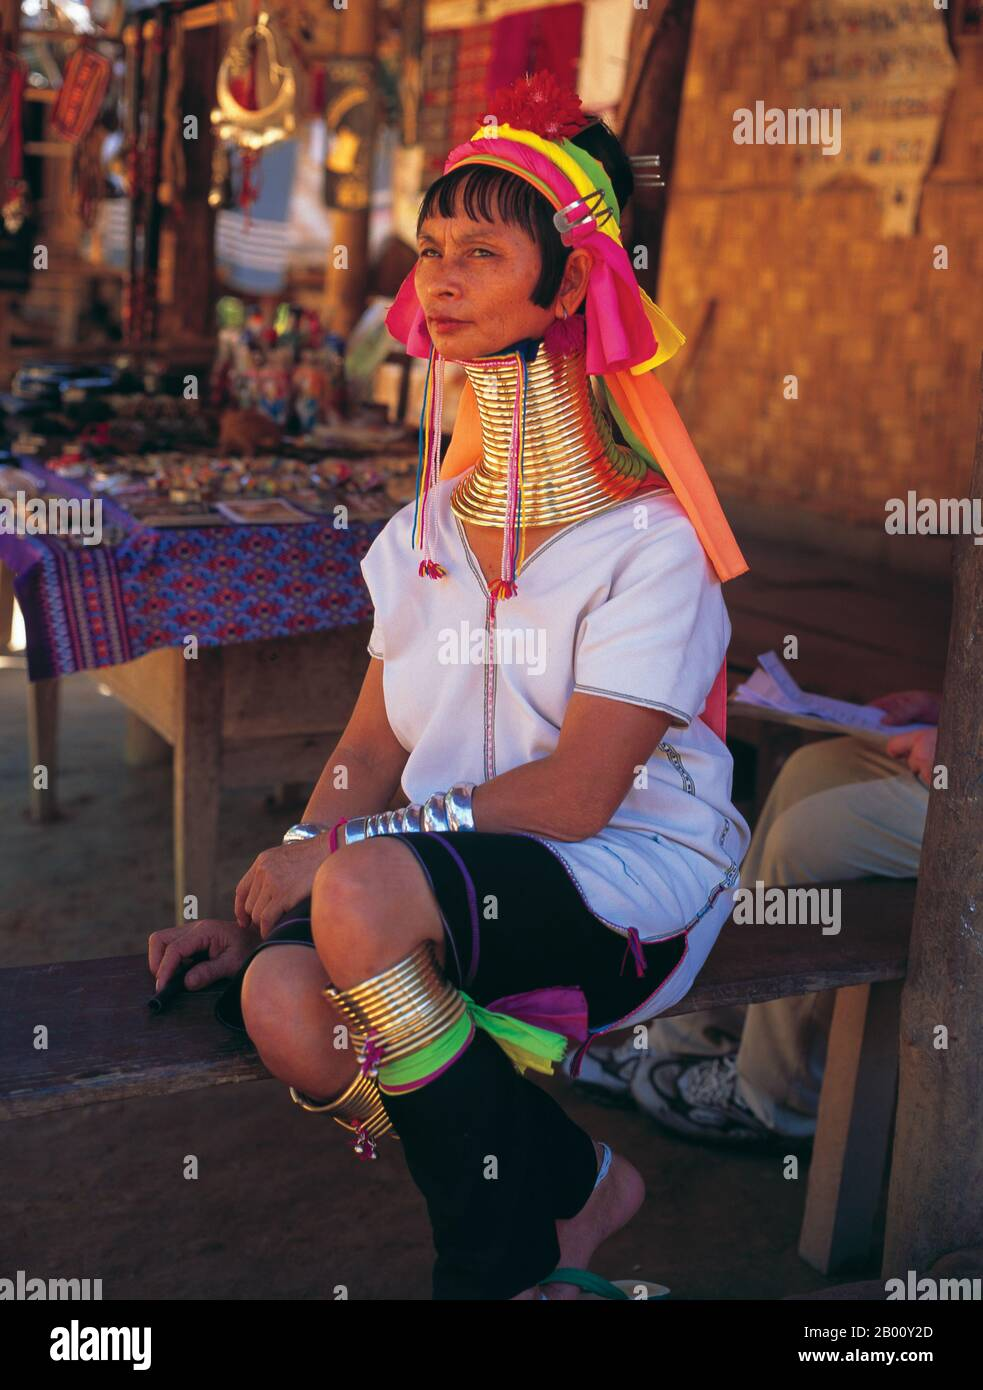 Thailand: Padaung (Long Neck Karen) woman, village near Mae Hong Son.  The Padaung or Kayan Lahwi or Long Necked Karen are a subgroup of the Kayan, a mix of Lawi tribe , Kayan tribe and several other tribes. Kayan are a subgroup Red Karen (Karenni) people, a Tibeto-Burman ethnic minority of Burma (Myanmar). Stock Photo